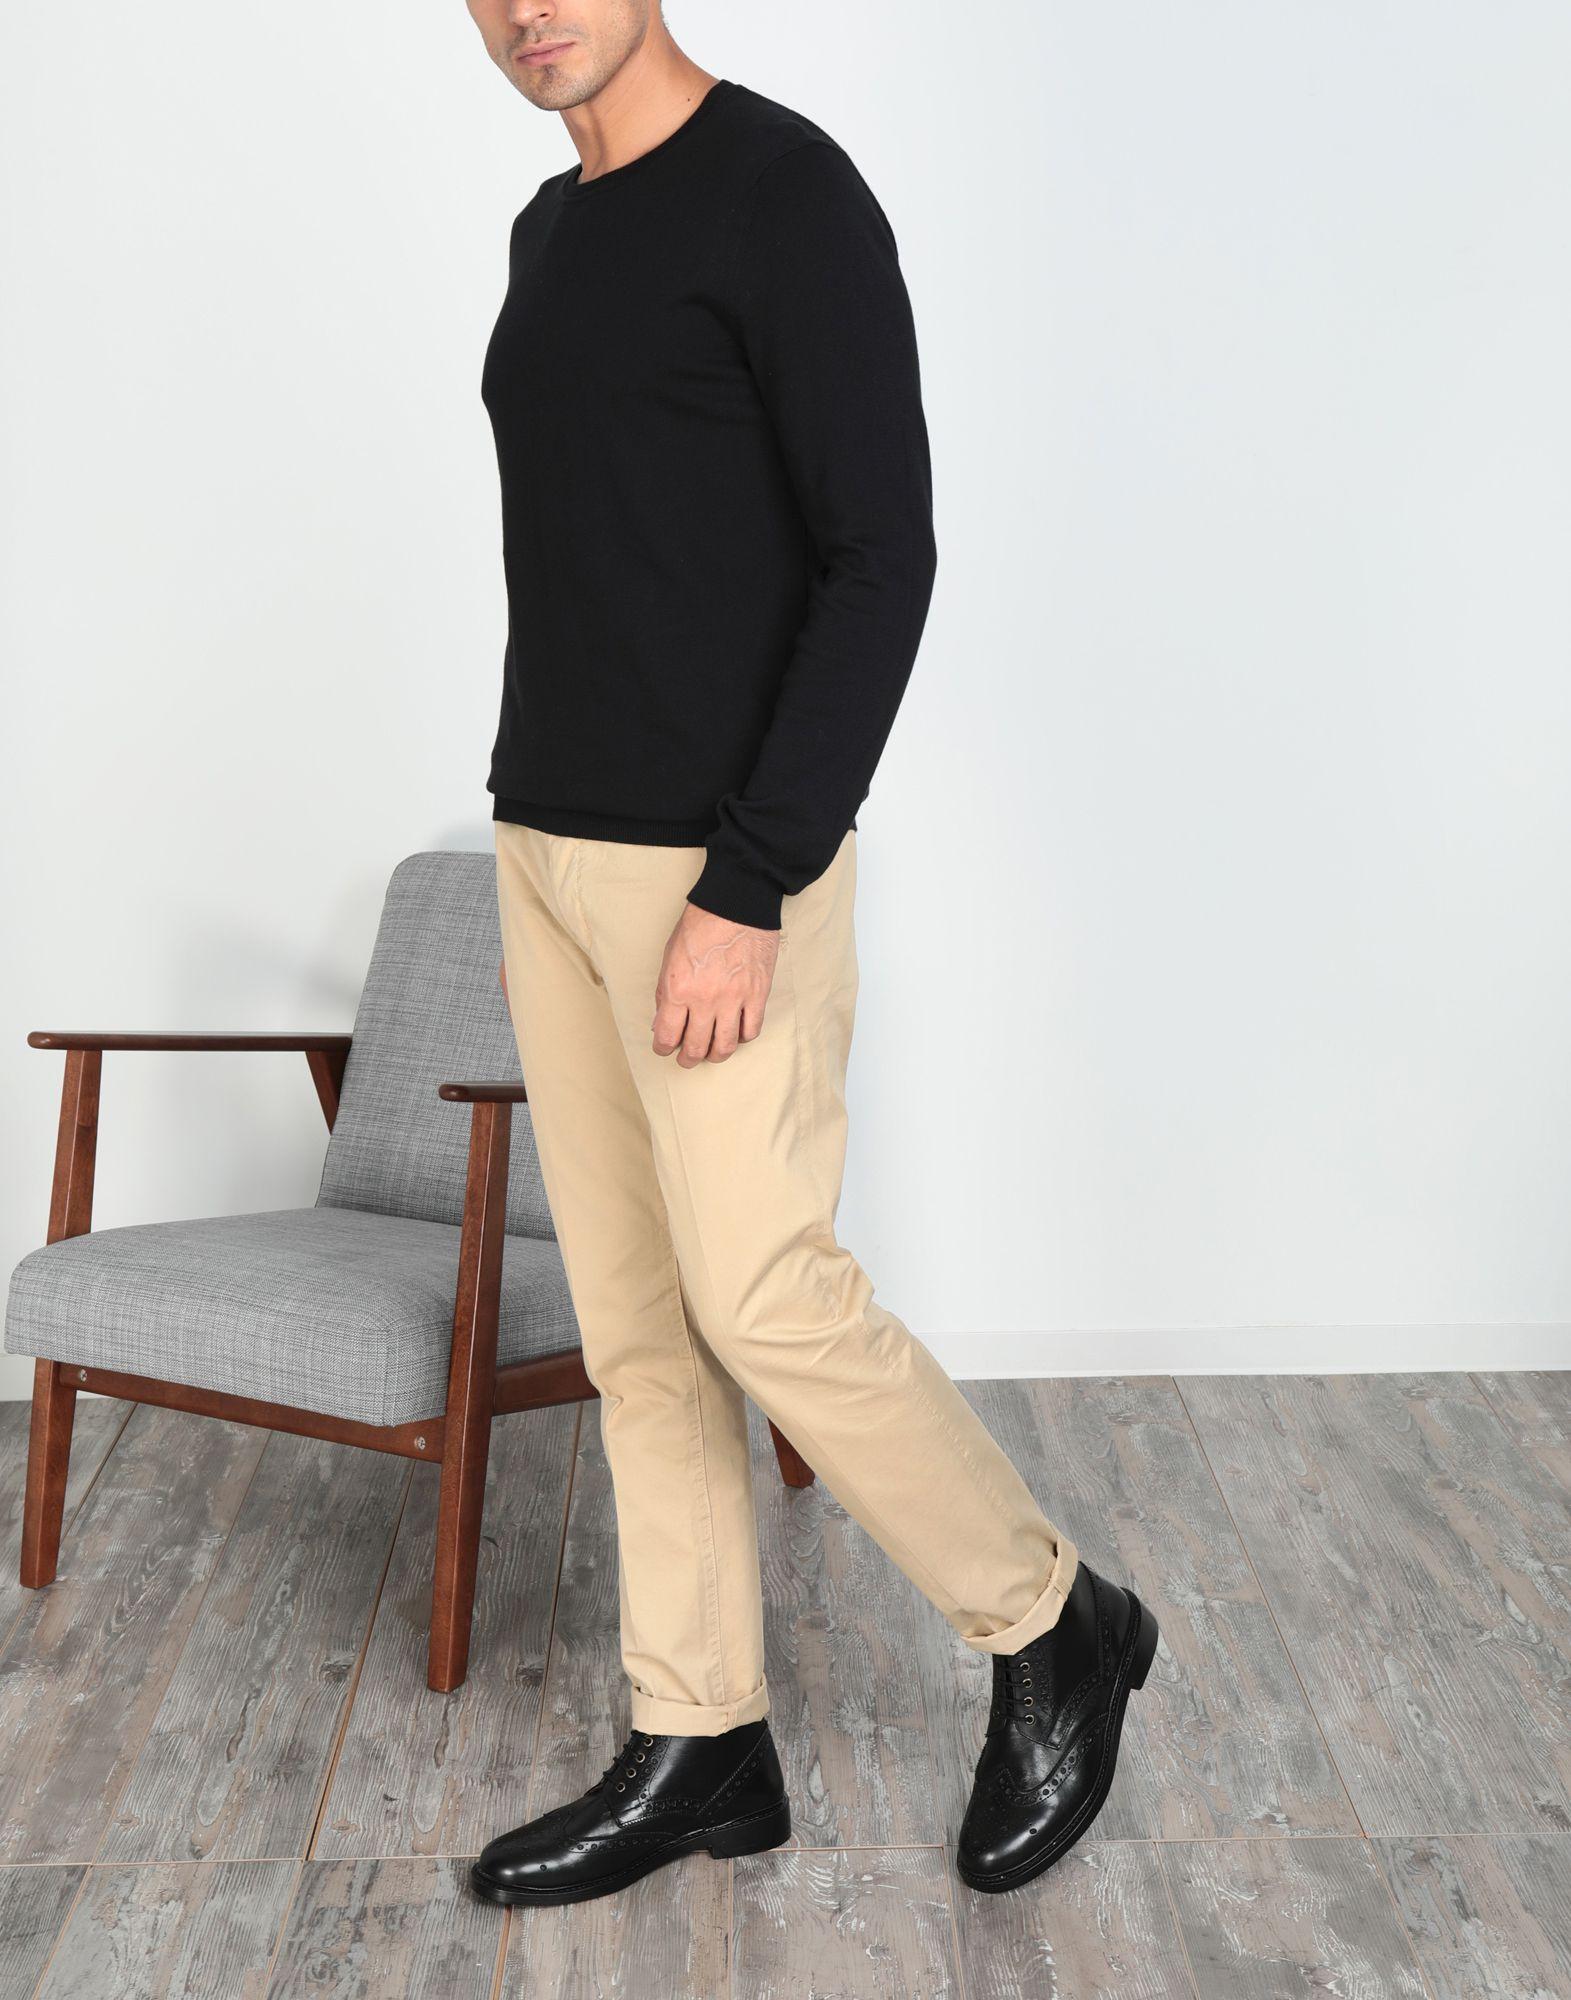 Leonardo Principi Stiefelette Herren  Schuhe 11539575OG Gute Qualität beliebte Schuhe  b04dea